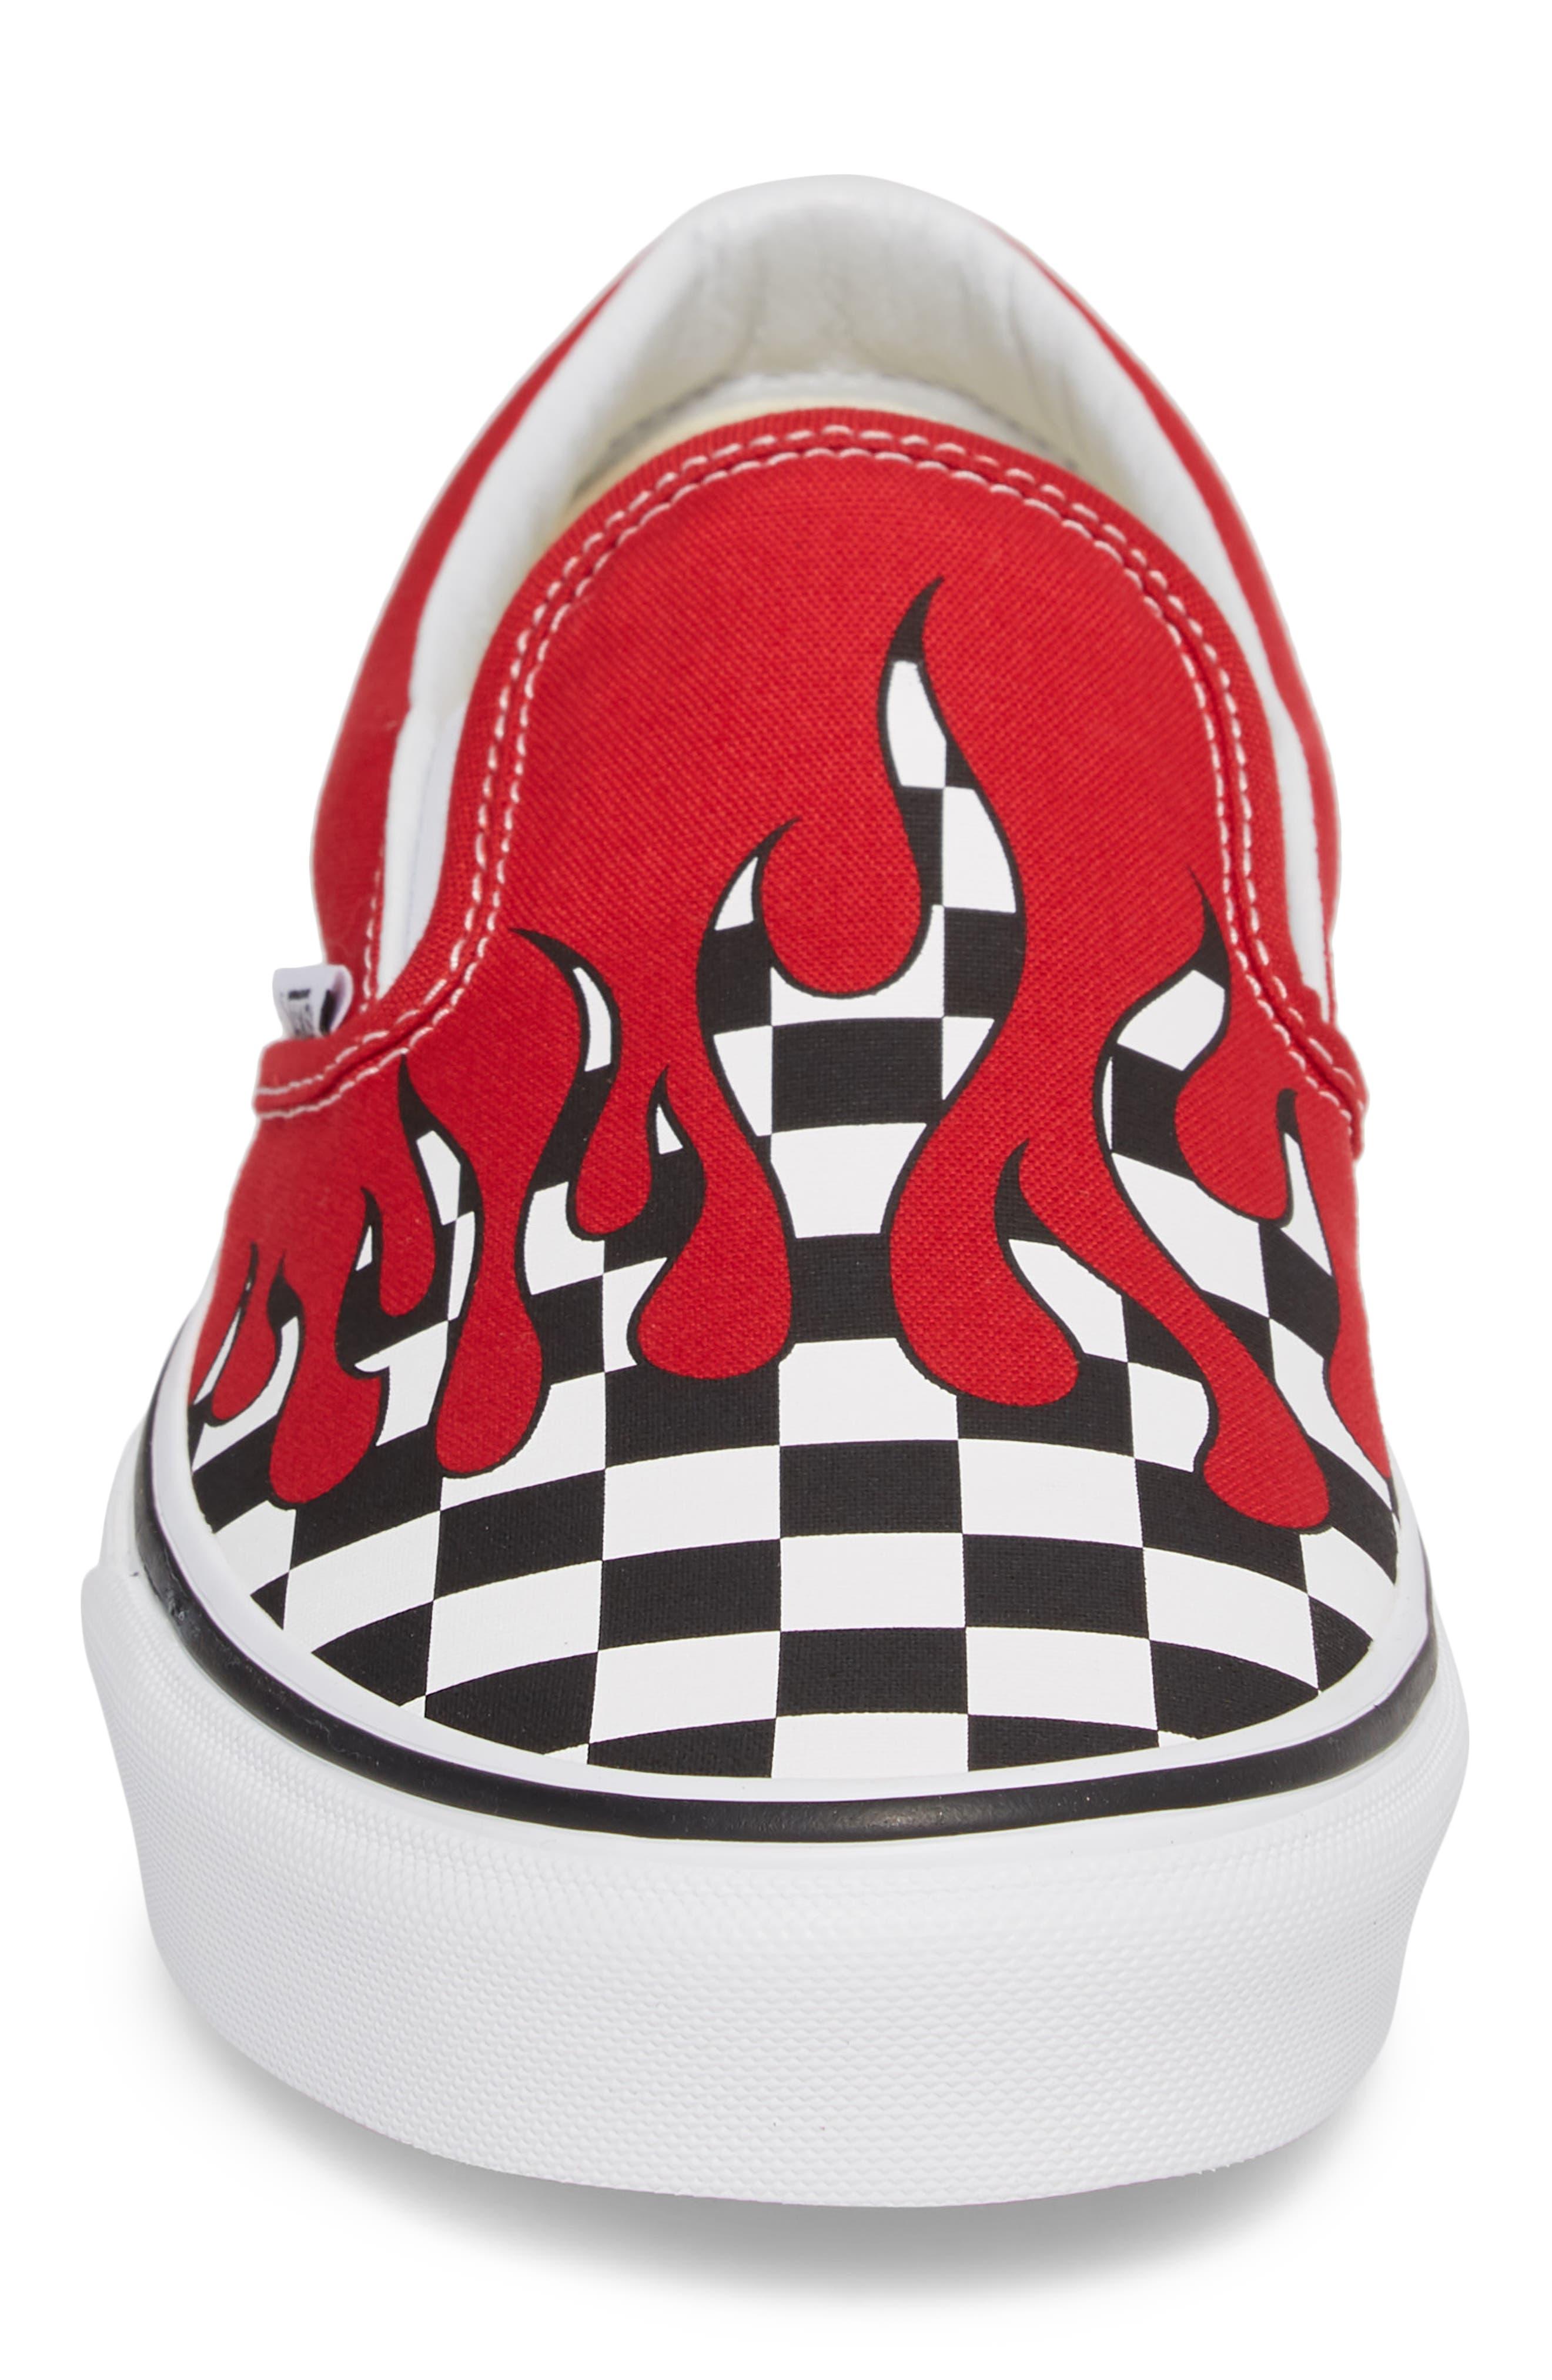 UA Classic Slip-On Sneaker,                             Alternate thumbnail 5, color,                             Racing Red/ White Checker